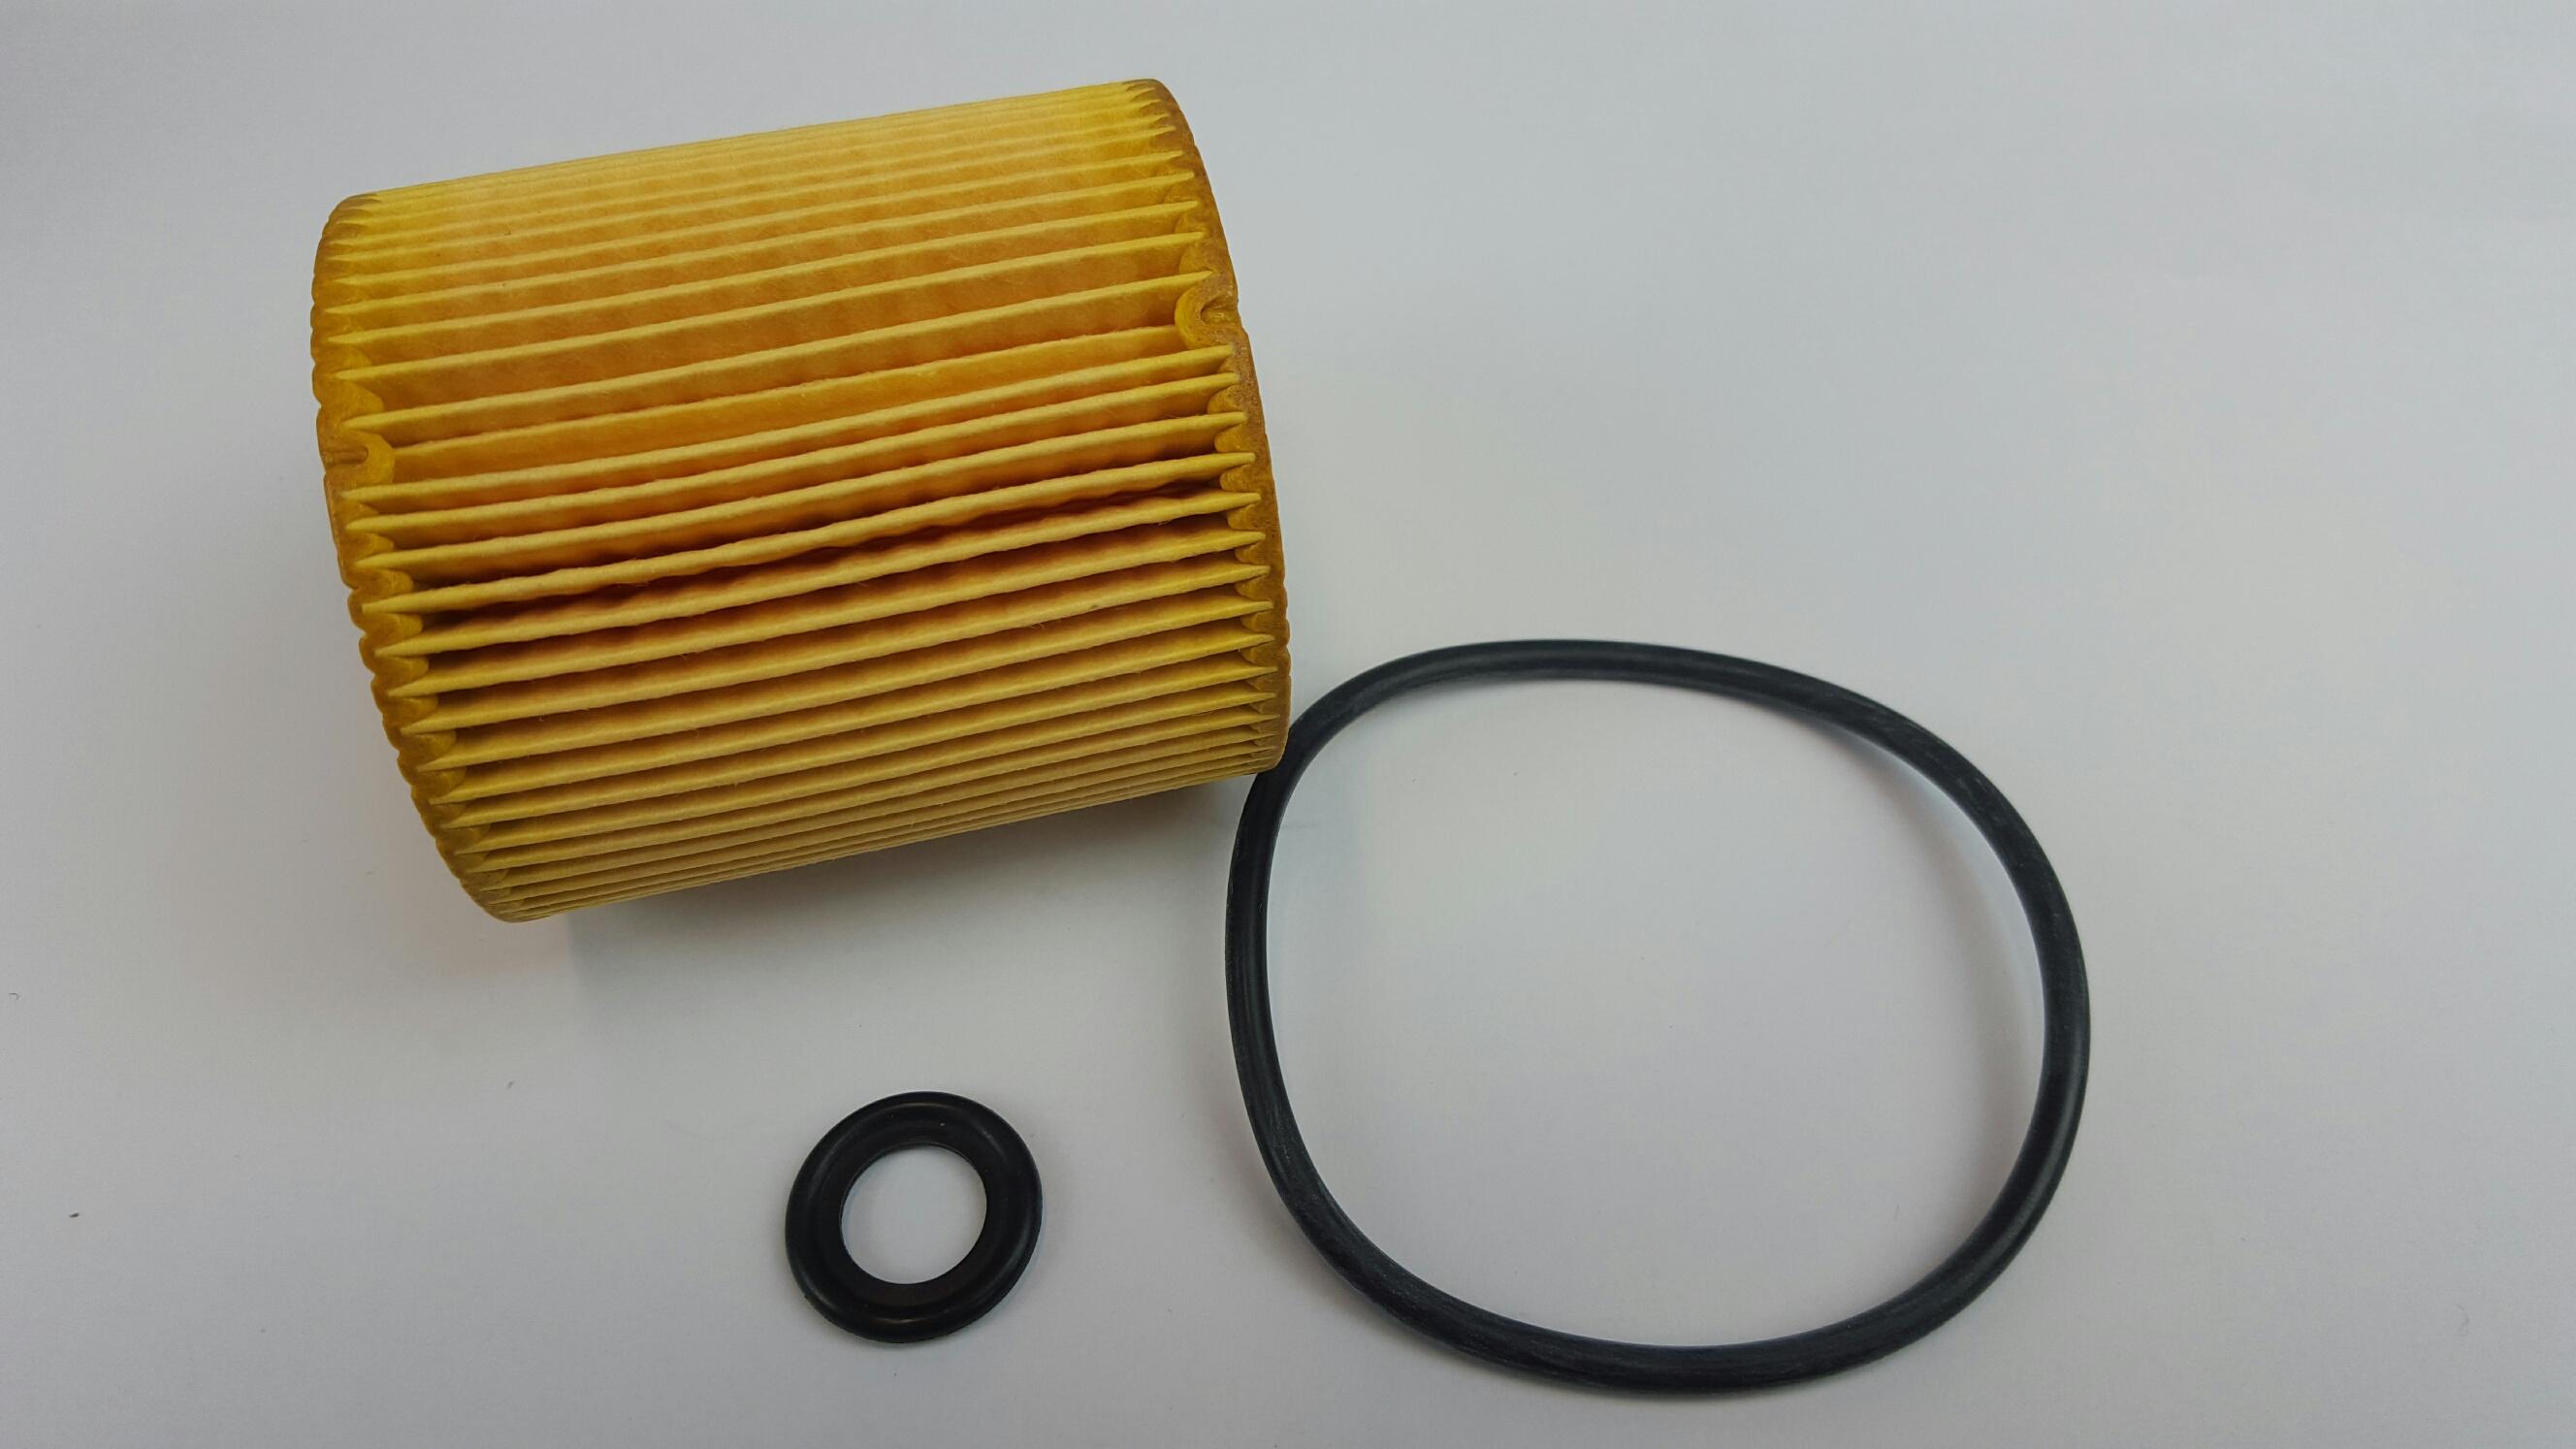 new genuine mazda bt-50 oil filter & rubber sump plug washer bt50